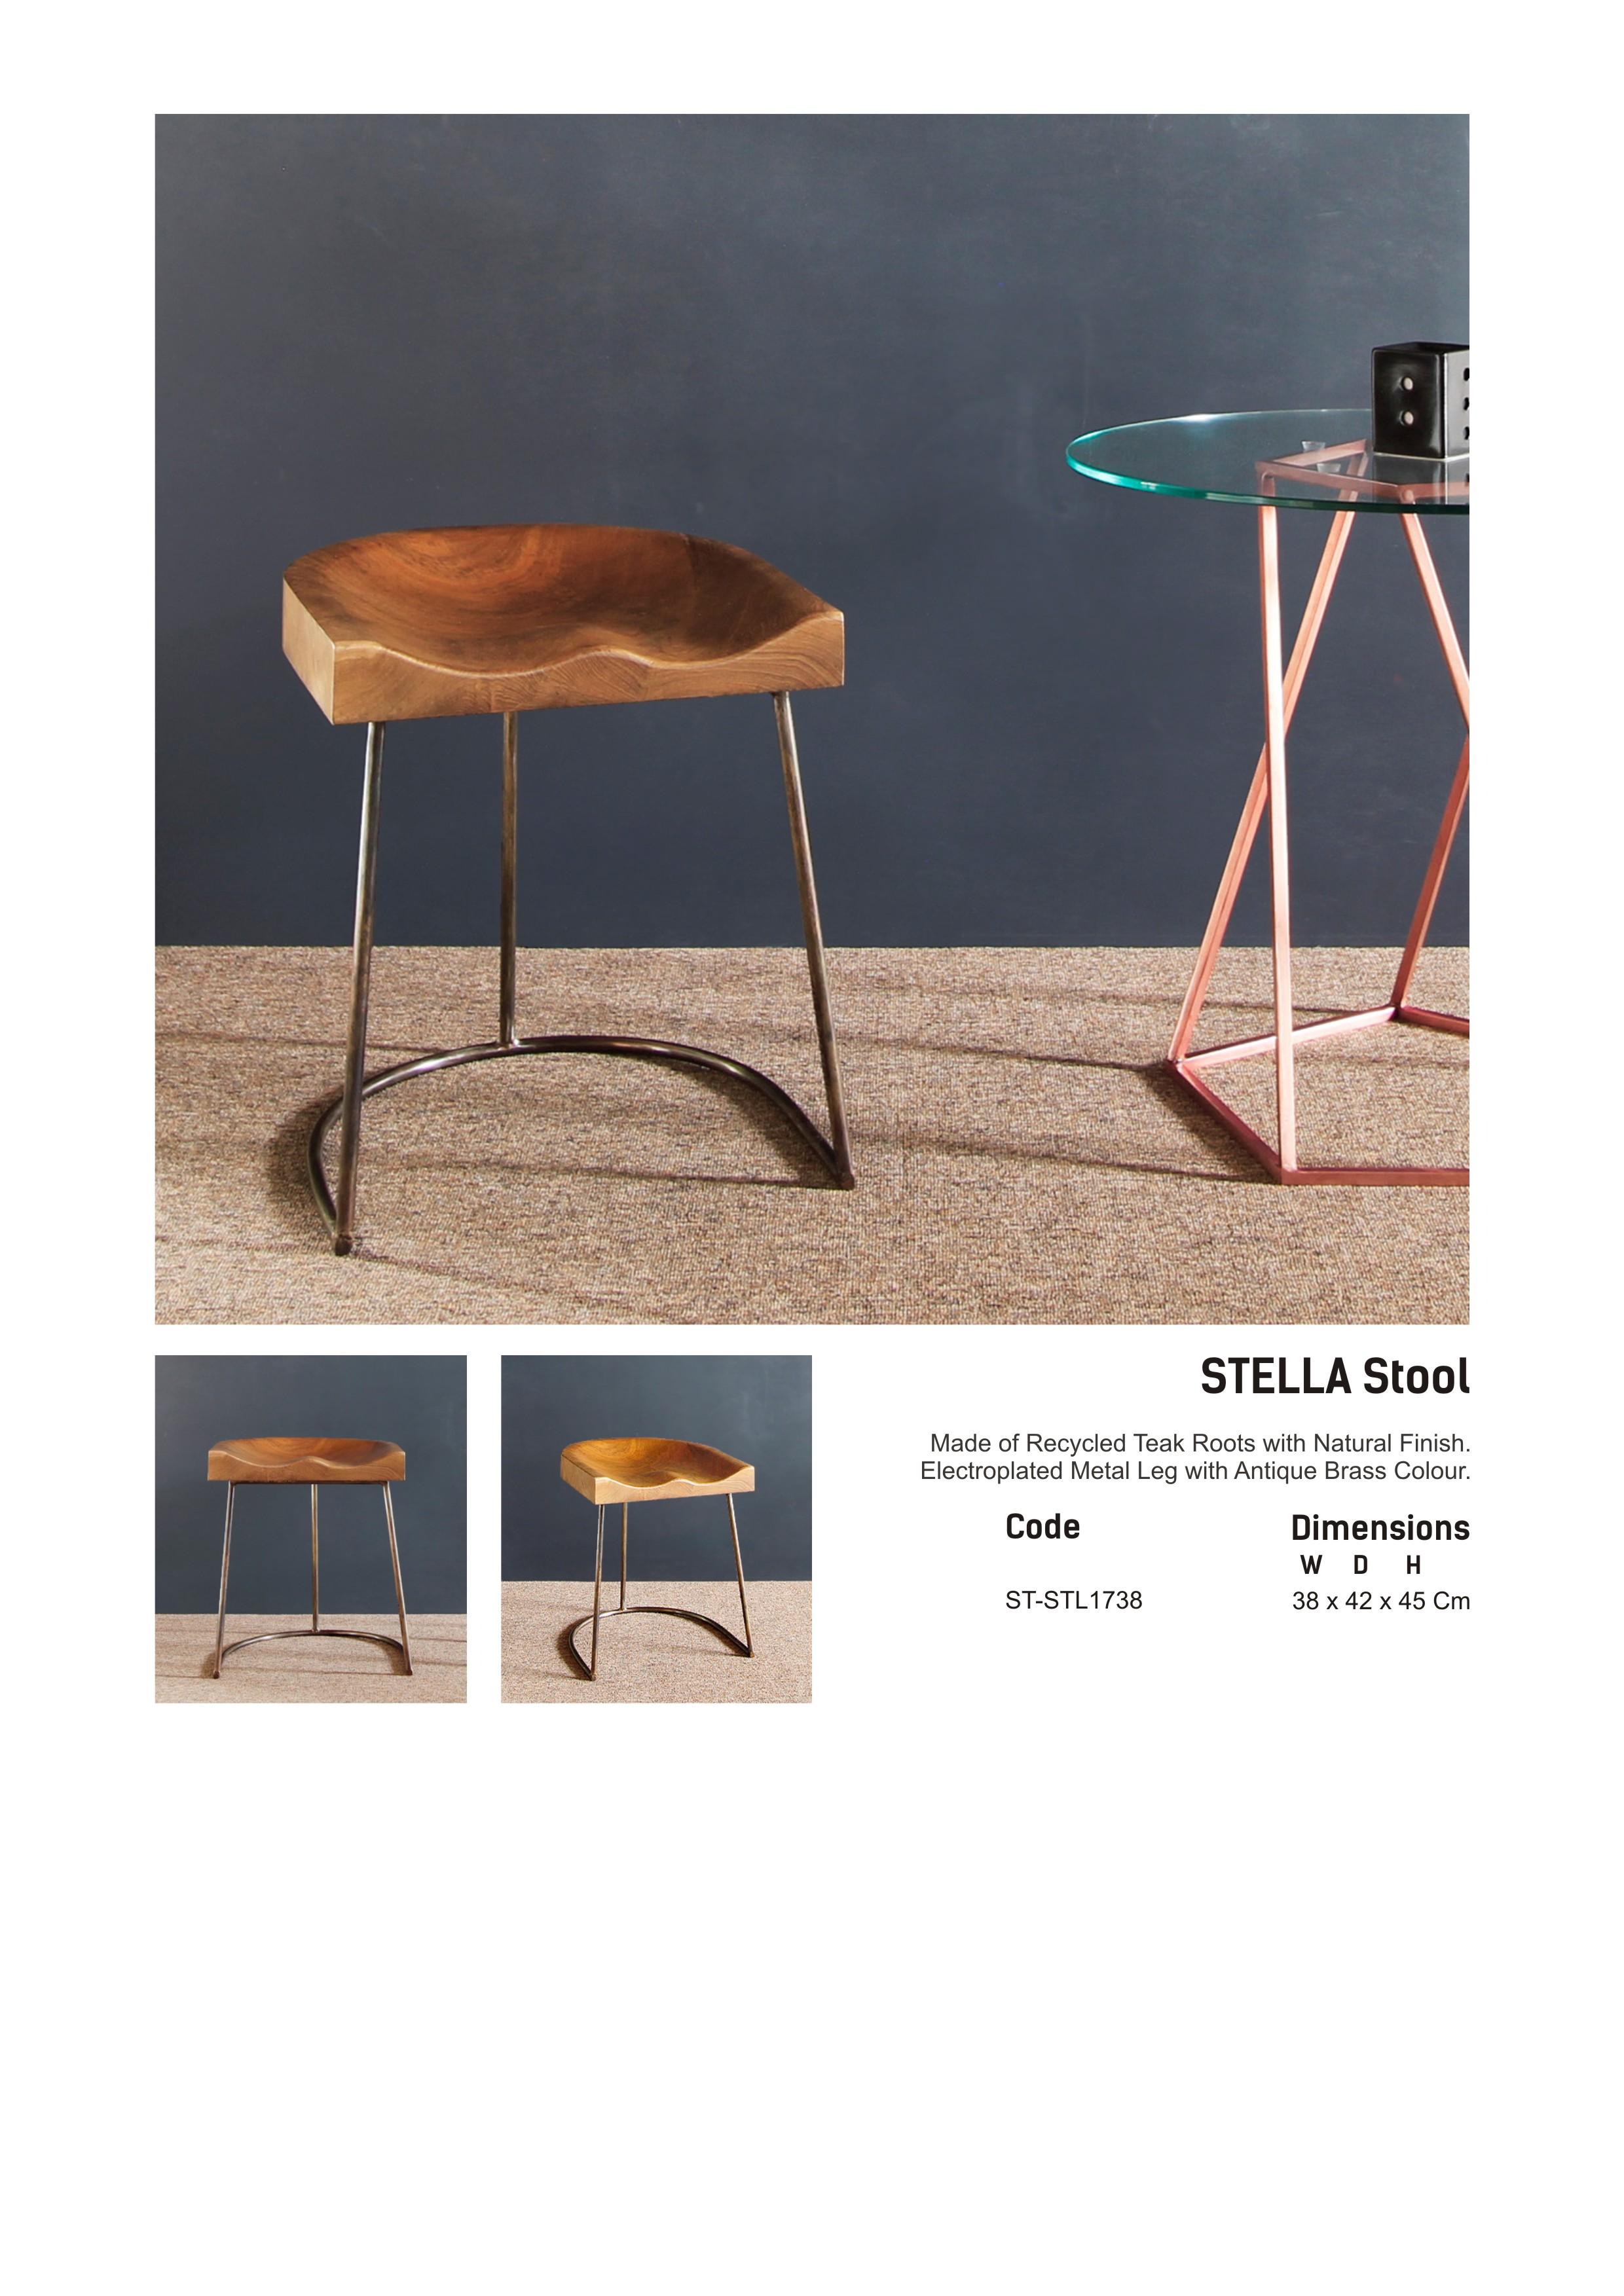 17. STELLA - Stool